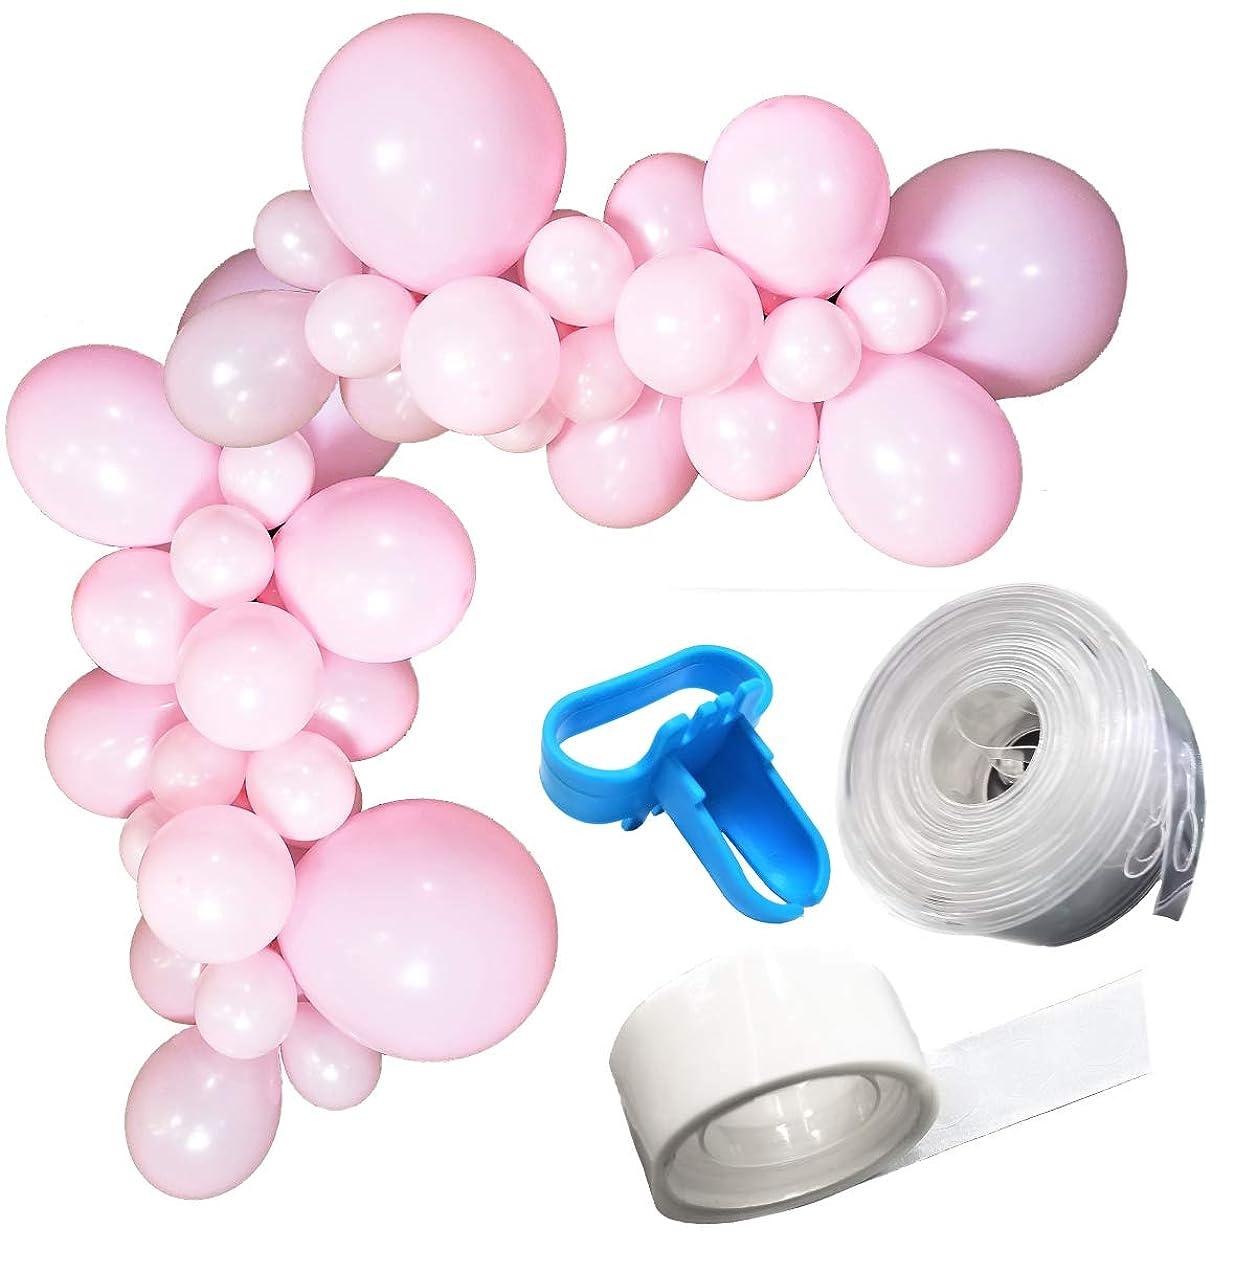 Buniluu Baby Pink Balloon Garland Kit | 50 pcs | Pink, Light Pink, Solid Pink | 16ft Balloon Strip Tape | Balloon Tie Tool | DIY Special Events Birthday Weeding Holiday Creative Decorations vyuafjwk611